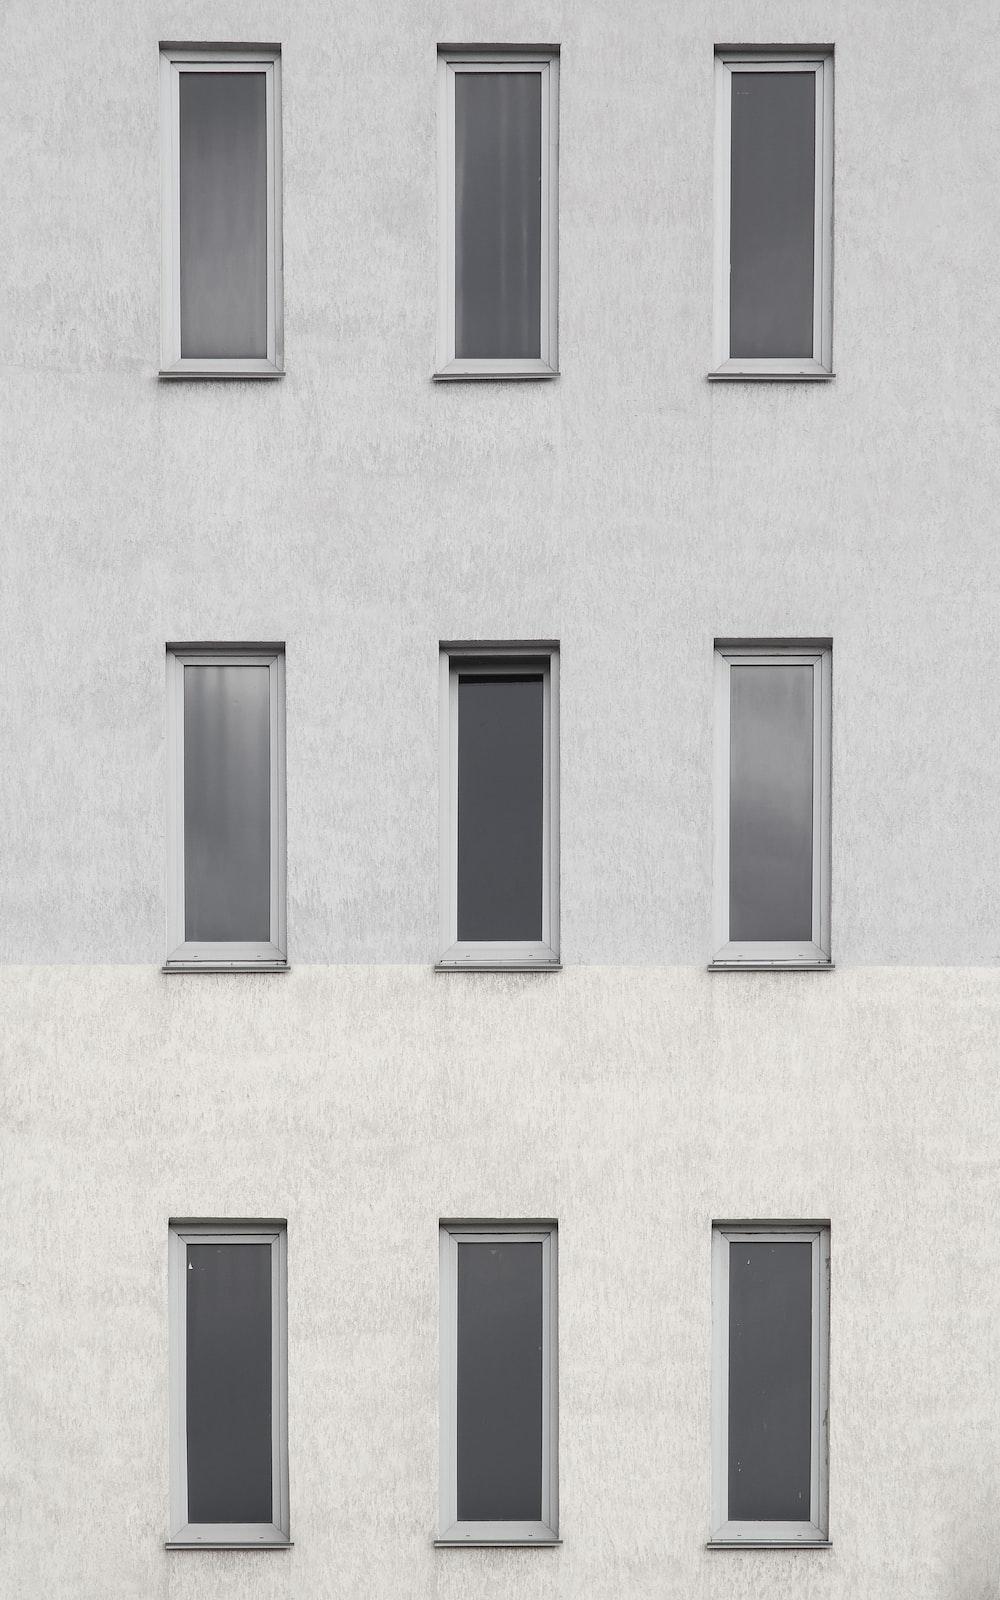 9 building windows